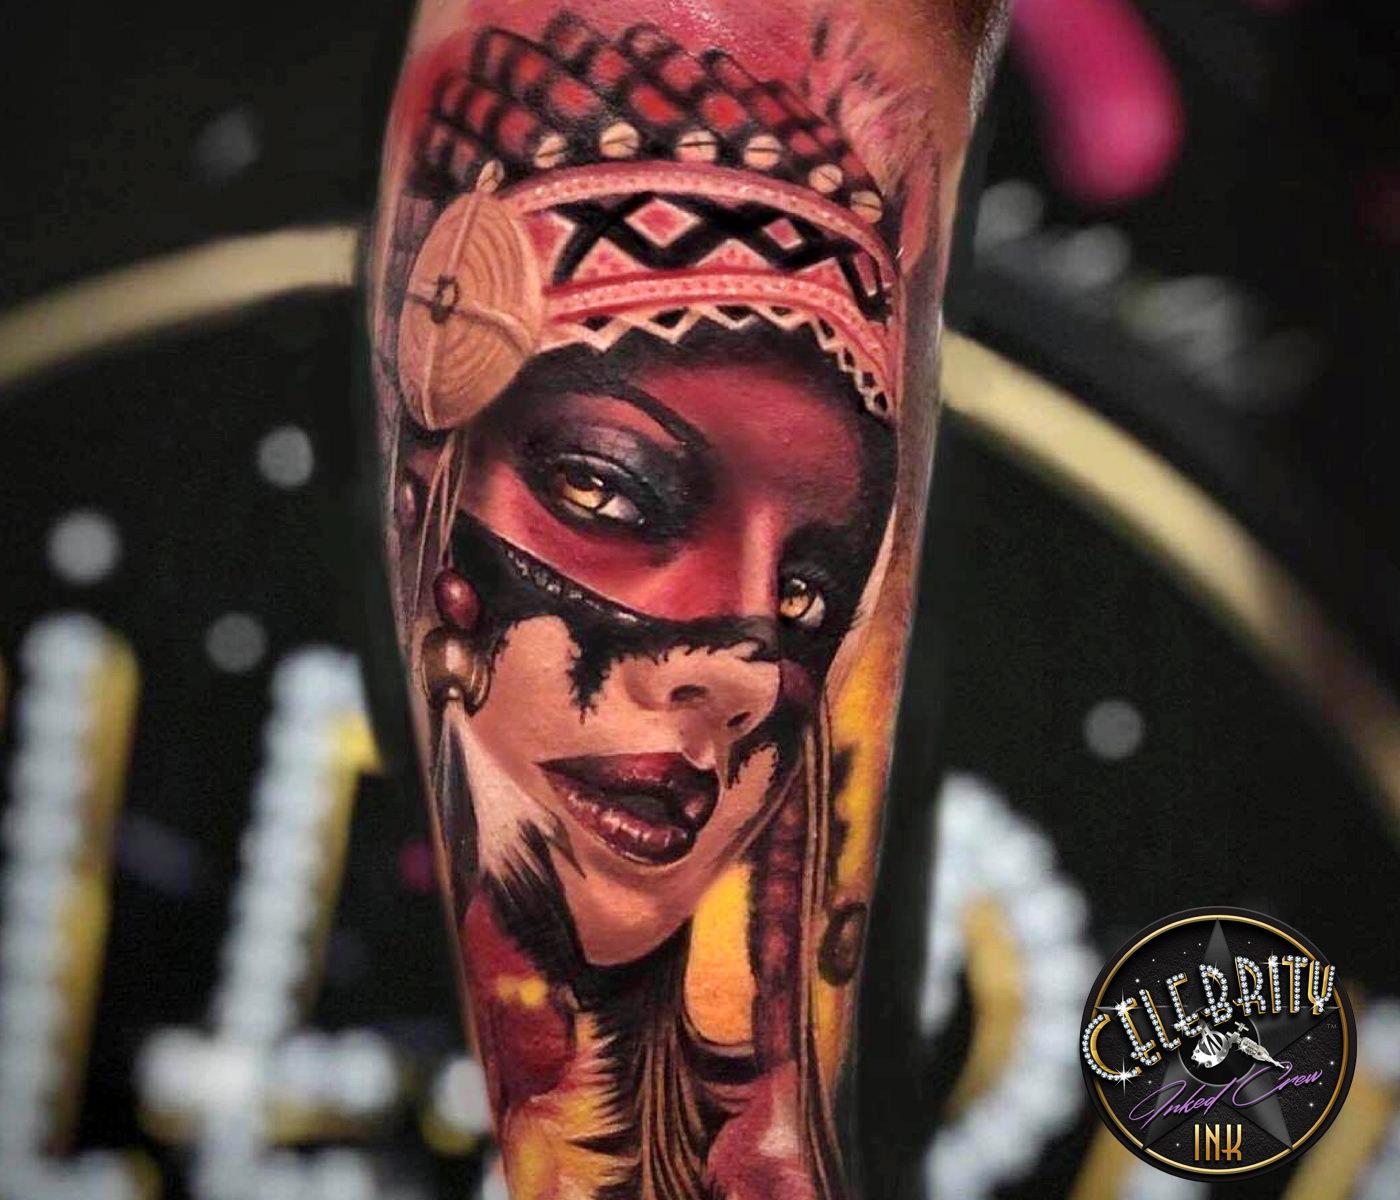 Inked Tattoos And Body Art Around The World